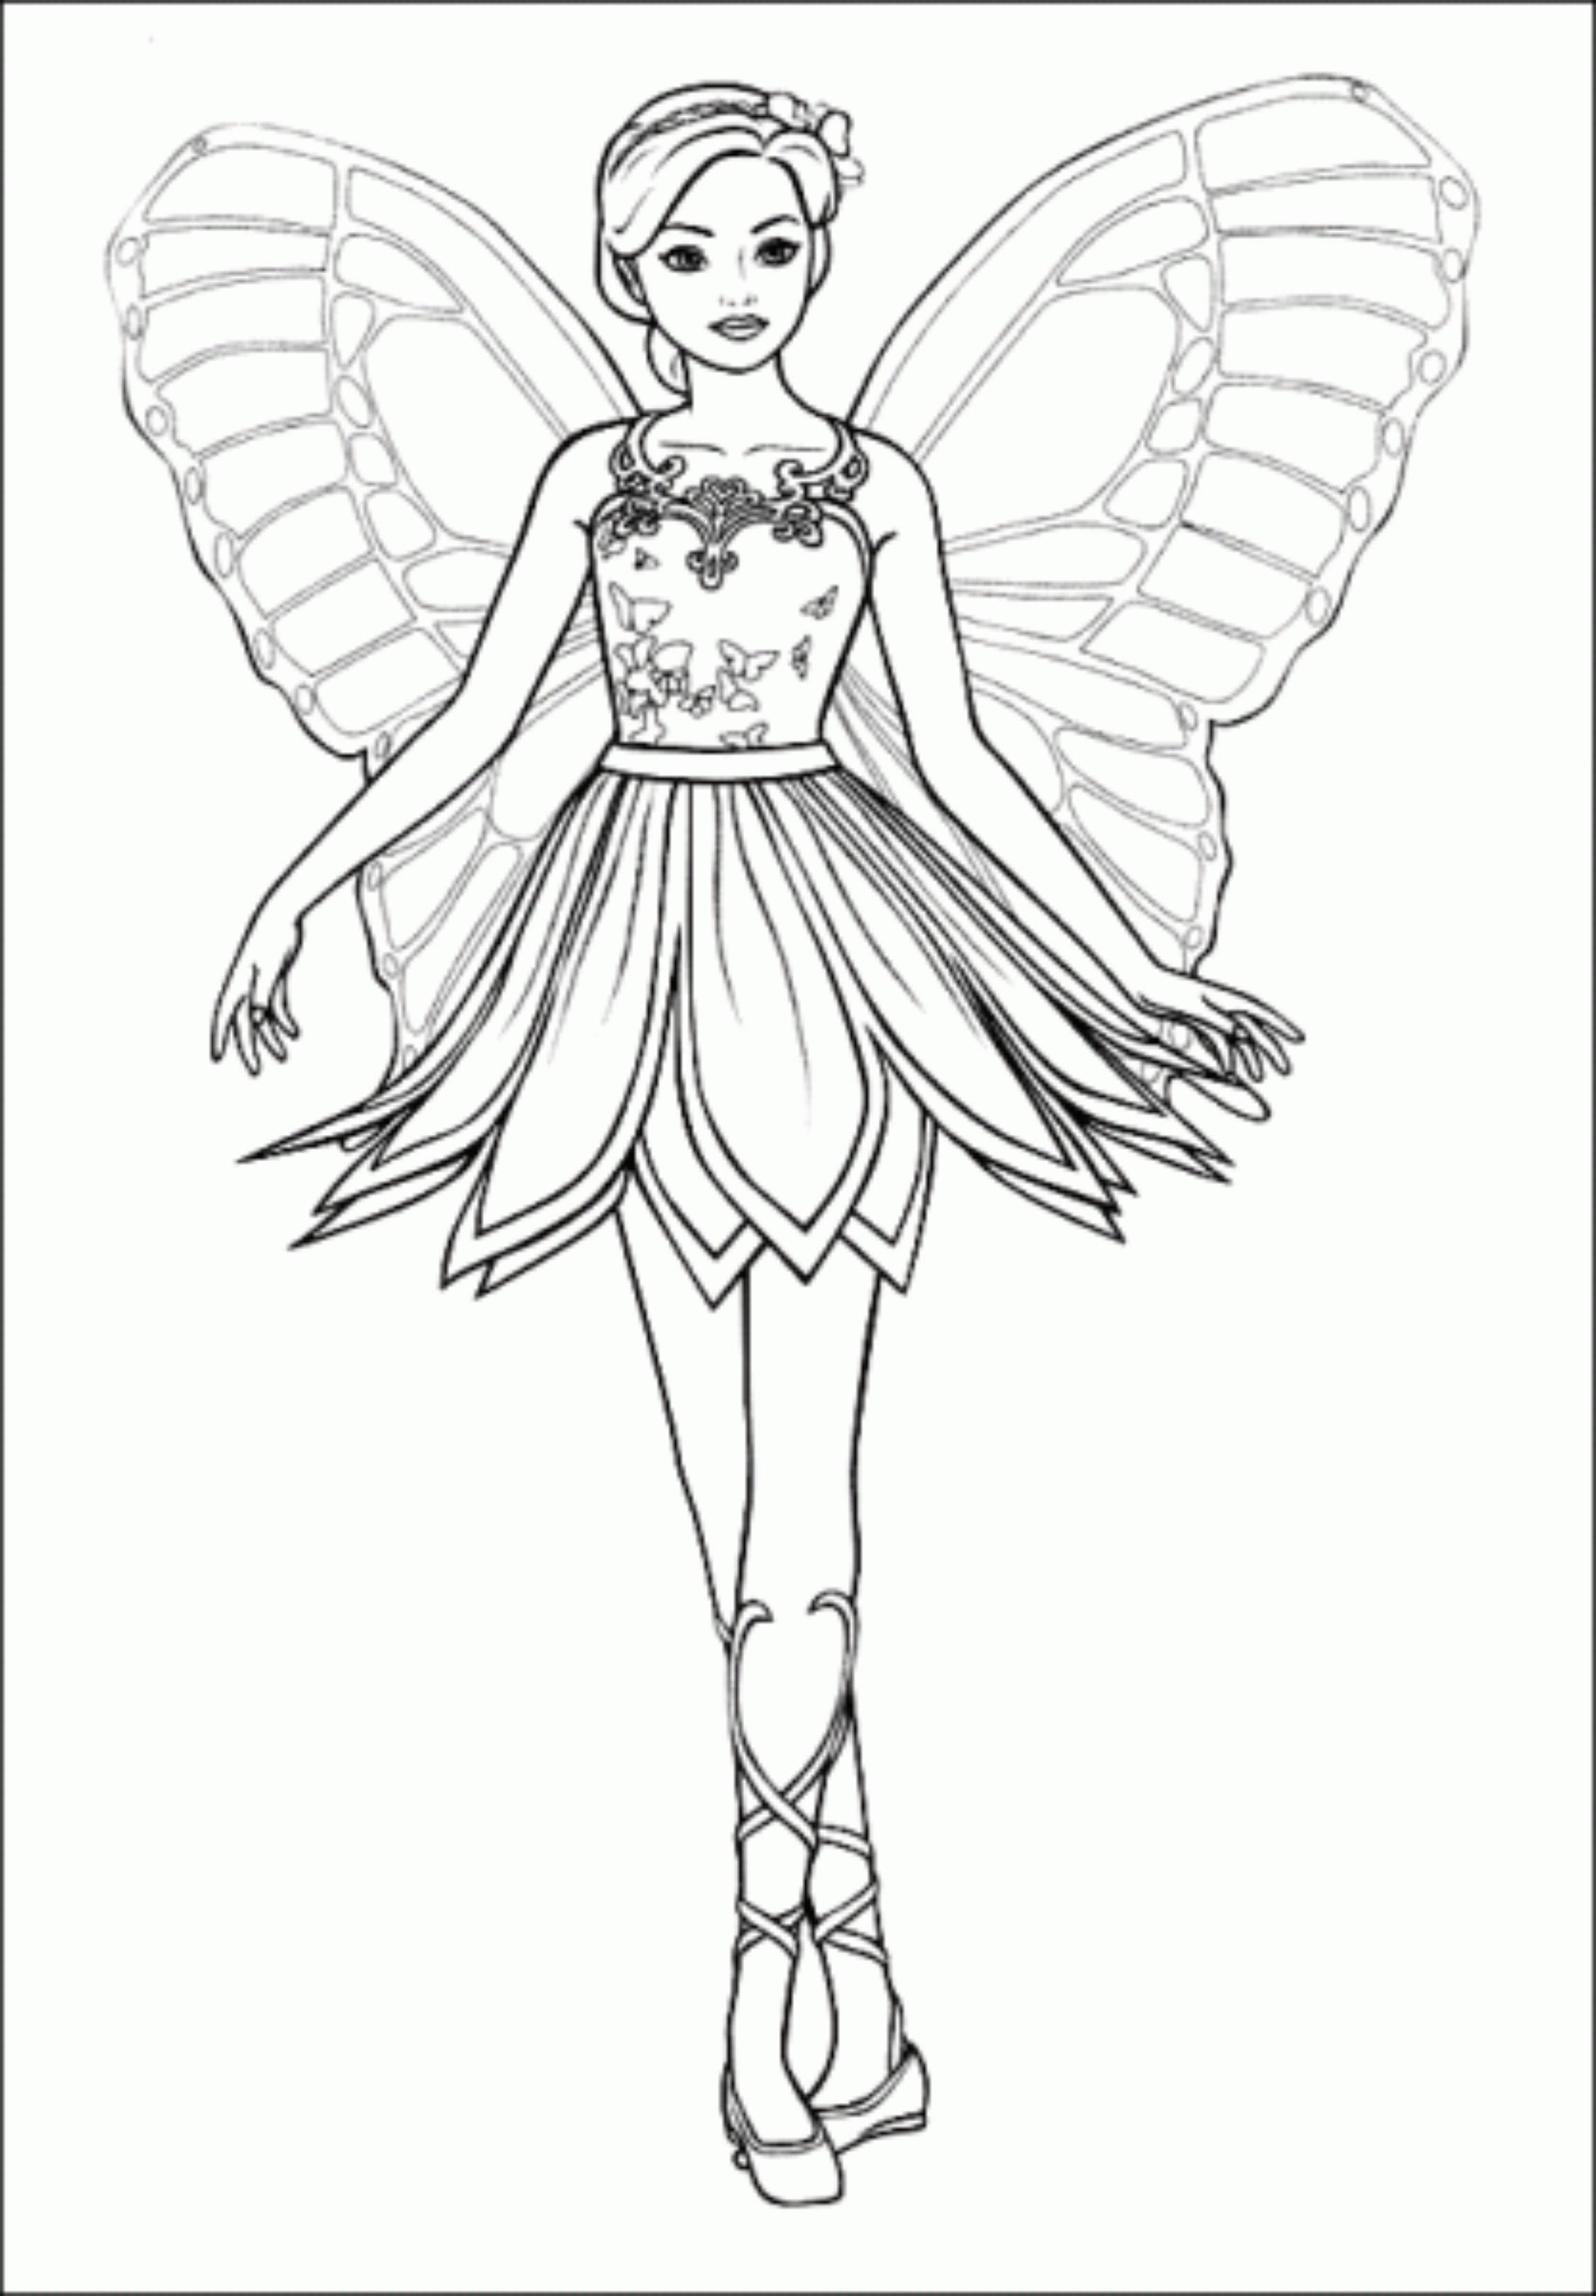 2250x3237 Pencil Sketch Barbie Images Pencil Drawing Barbie Doll